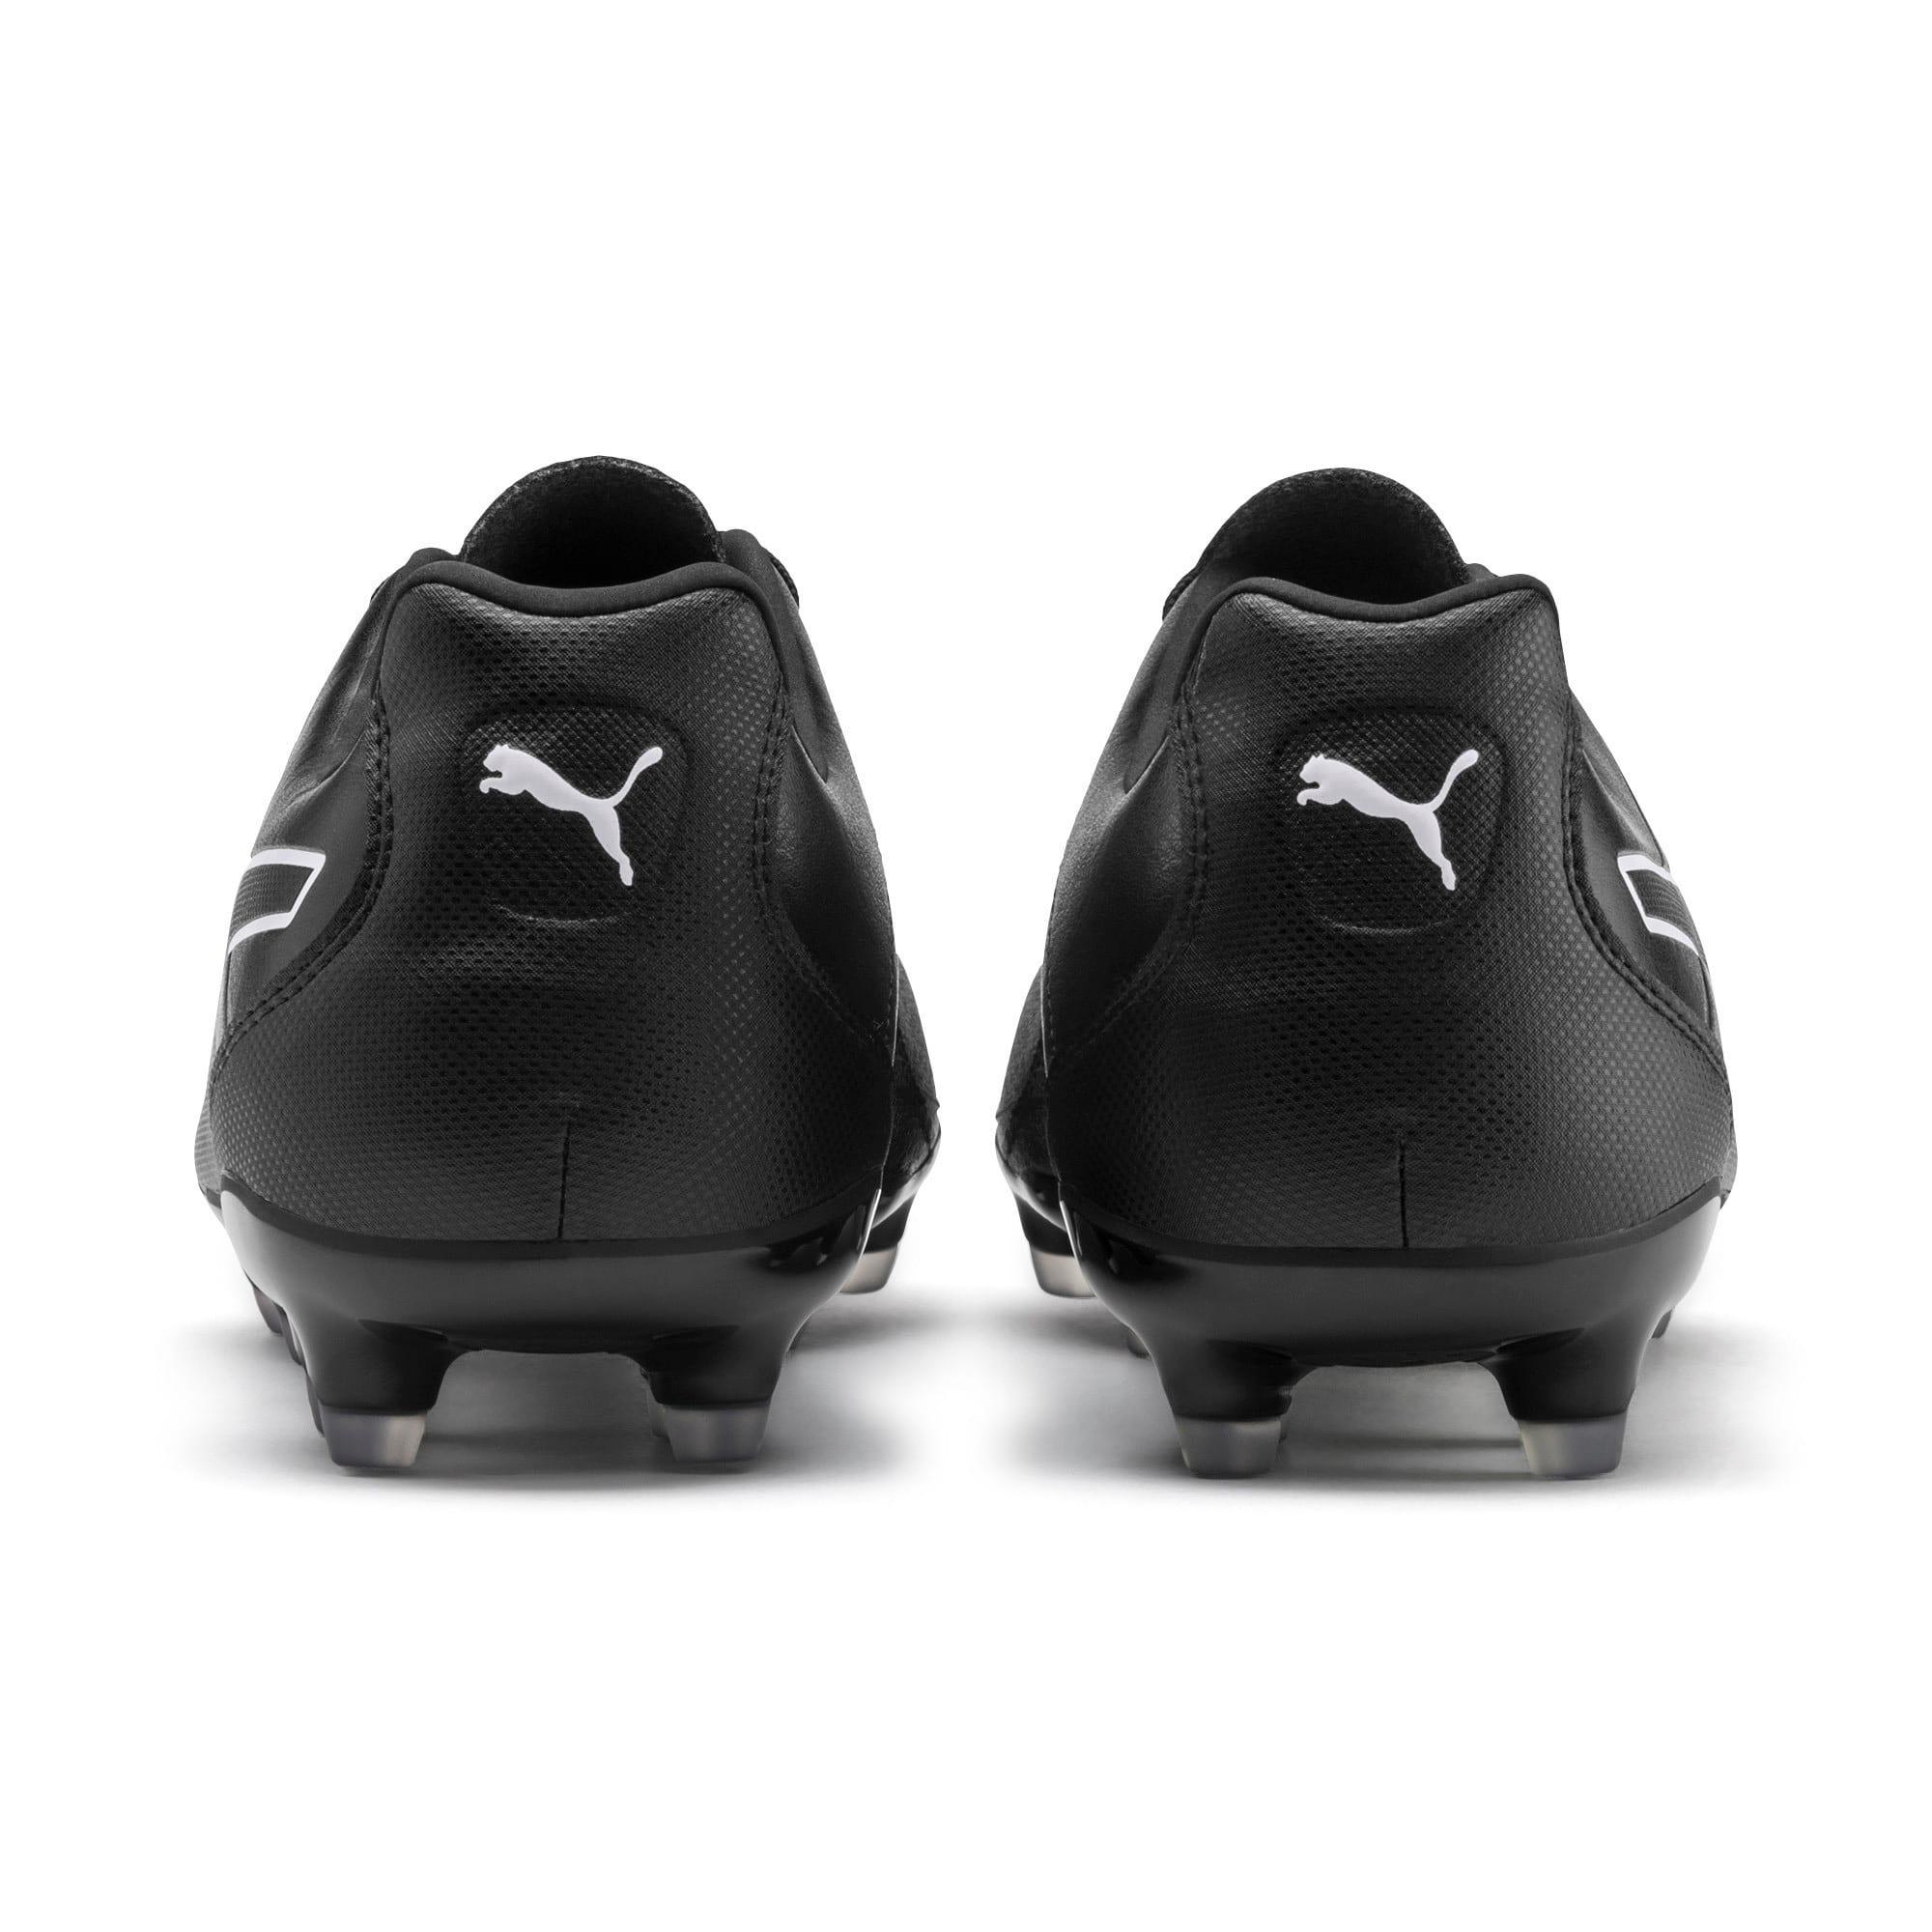 Thumbnail 5 of KING Hero FG Football Boots, Puma Black-Puma White, medium-IND